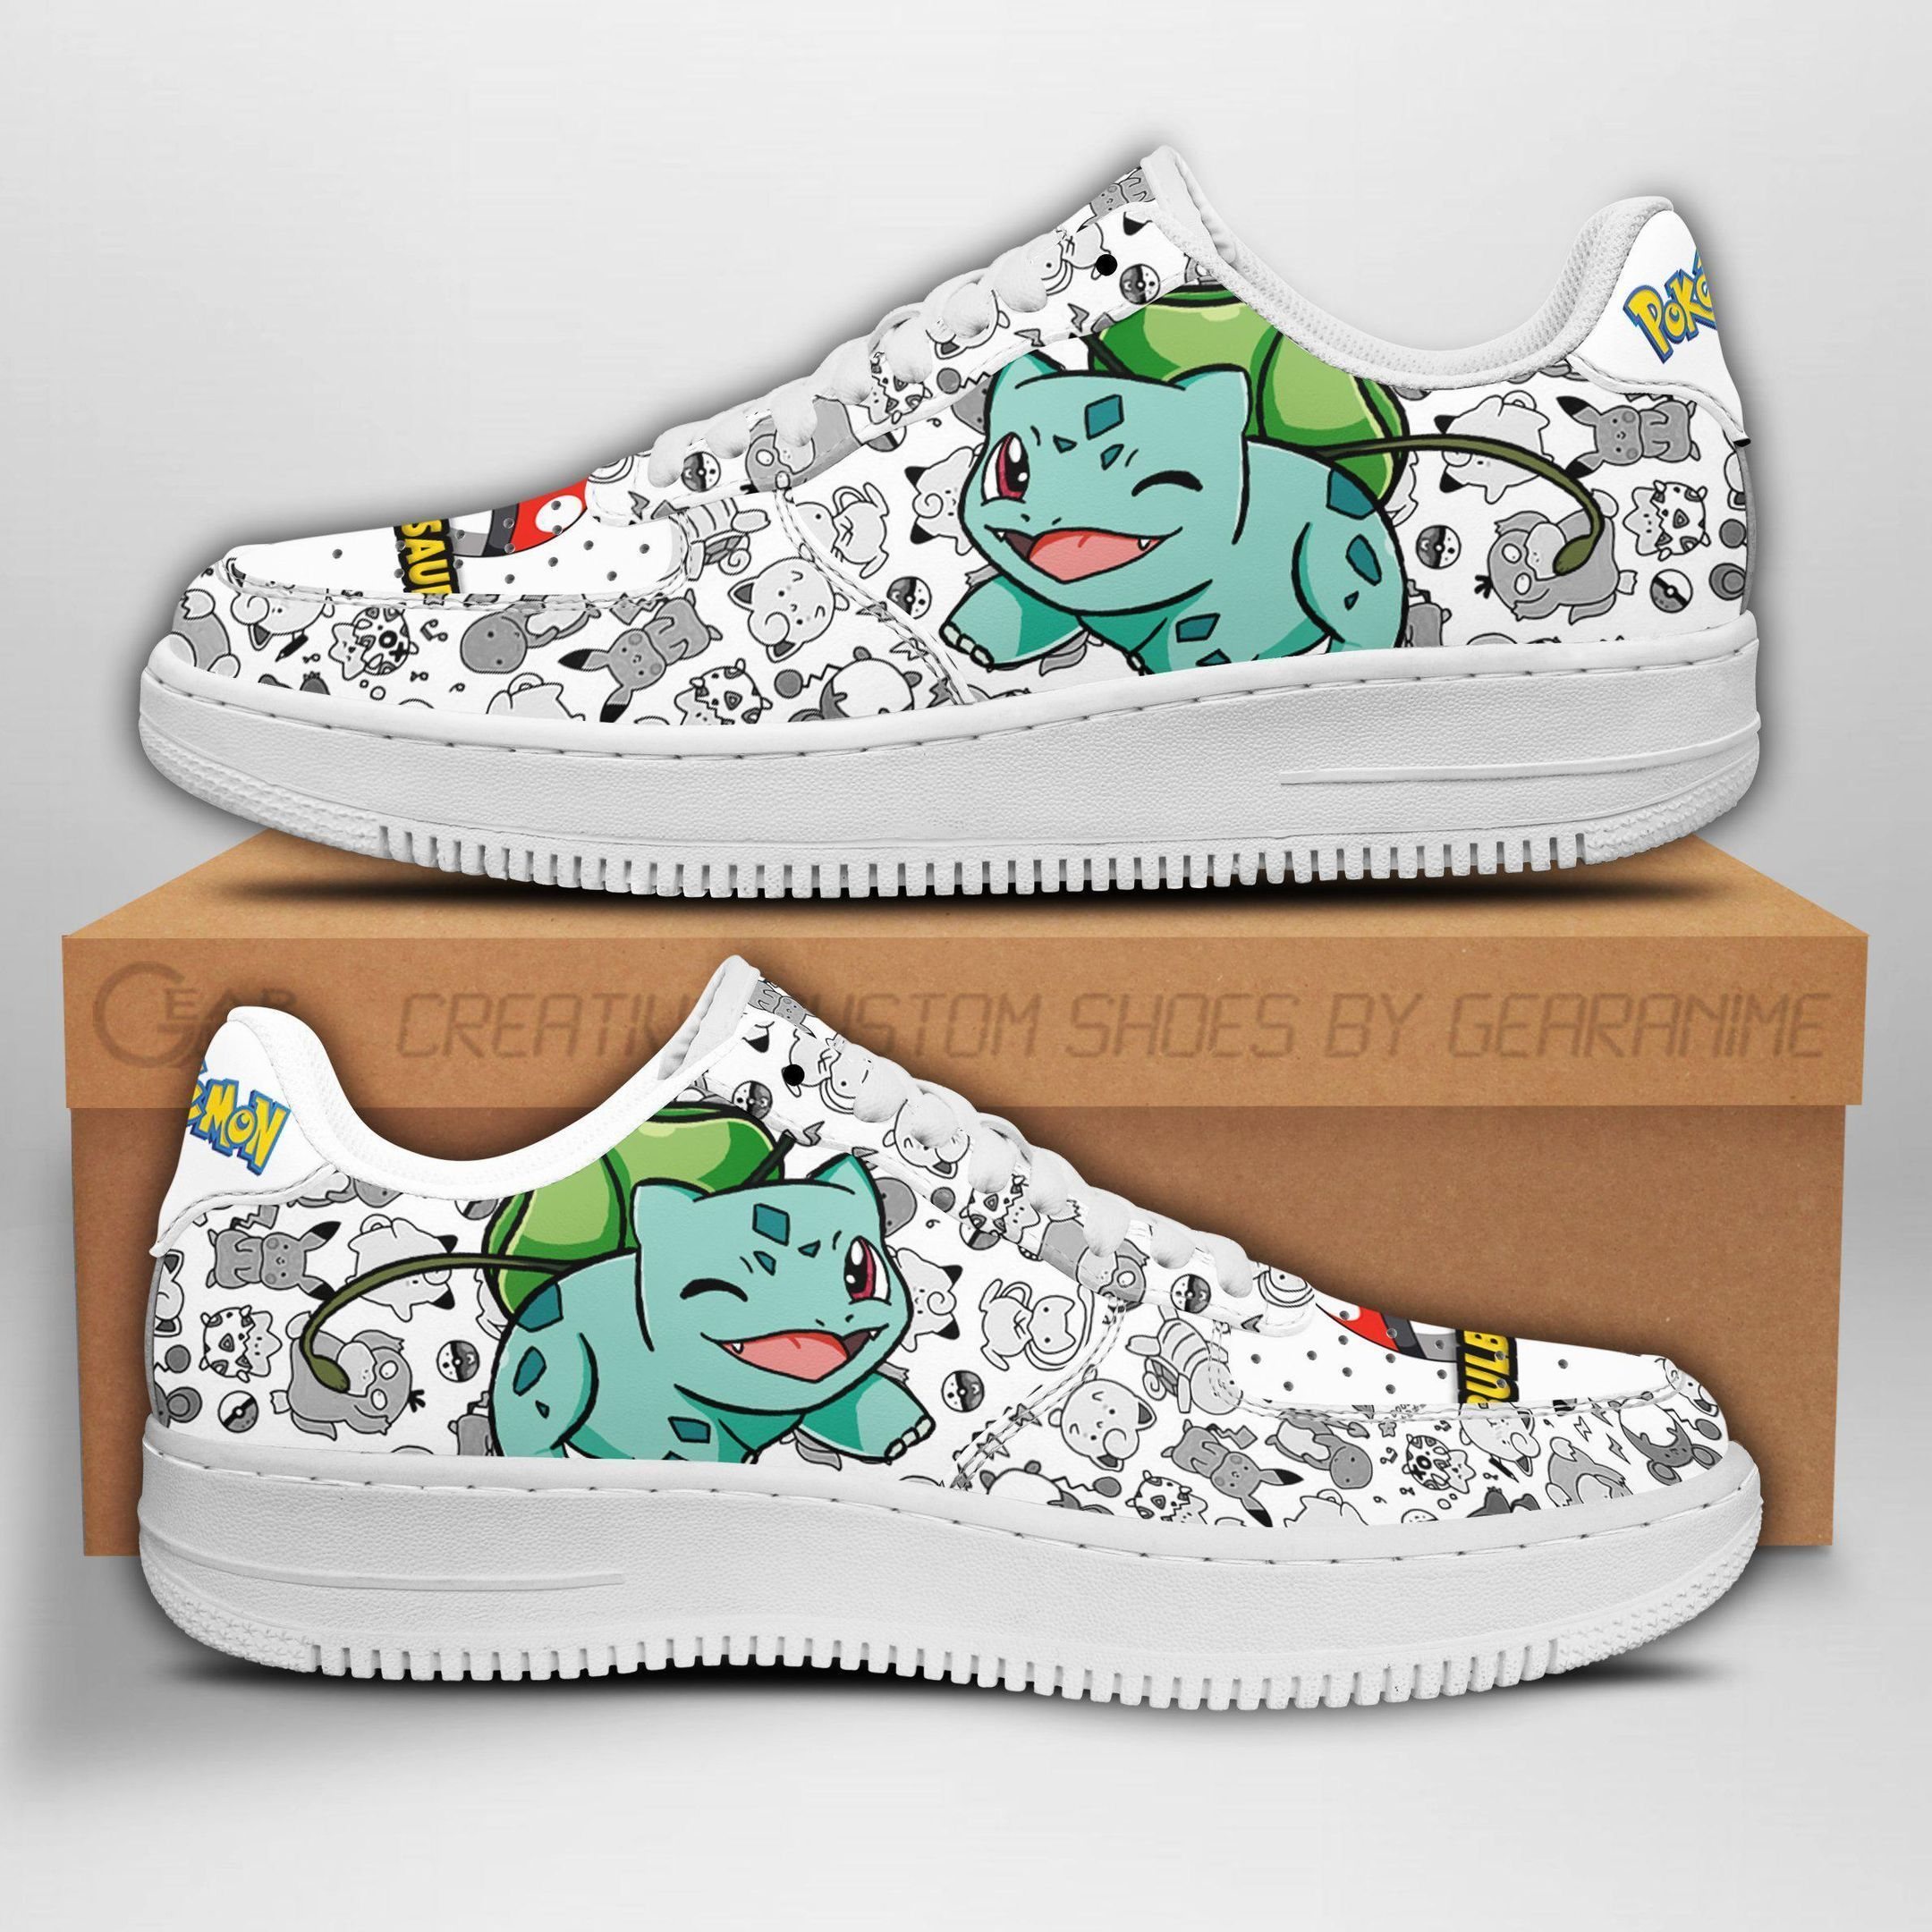 Bulbasaur Air Shoes Pokemon Shoes Fan Gift Idea GO1012